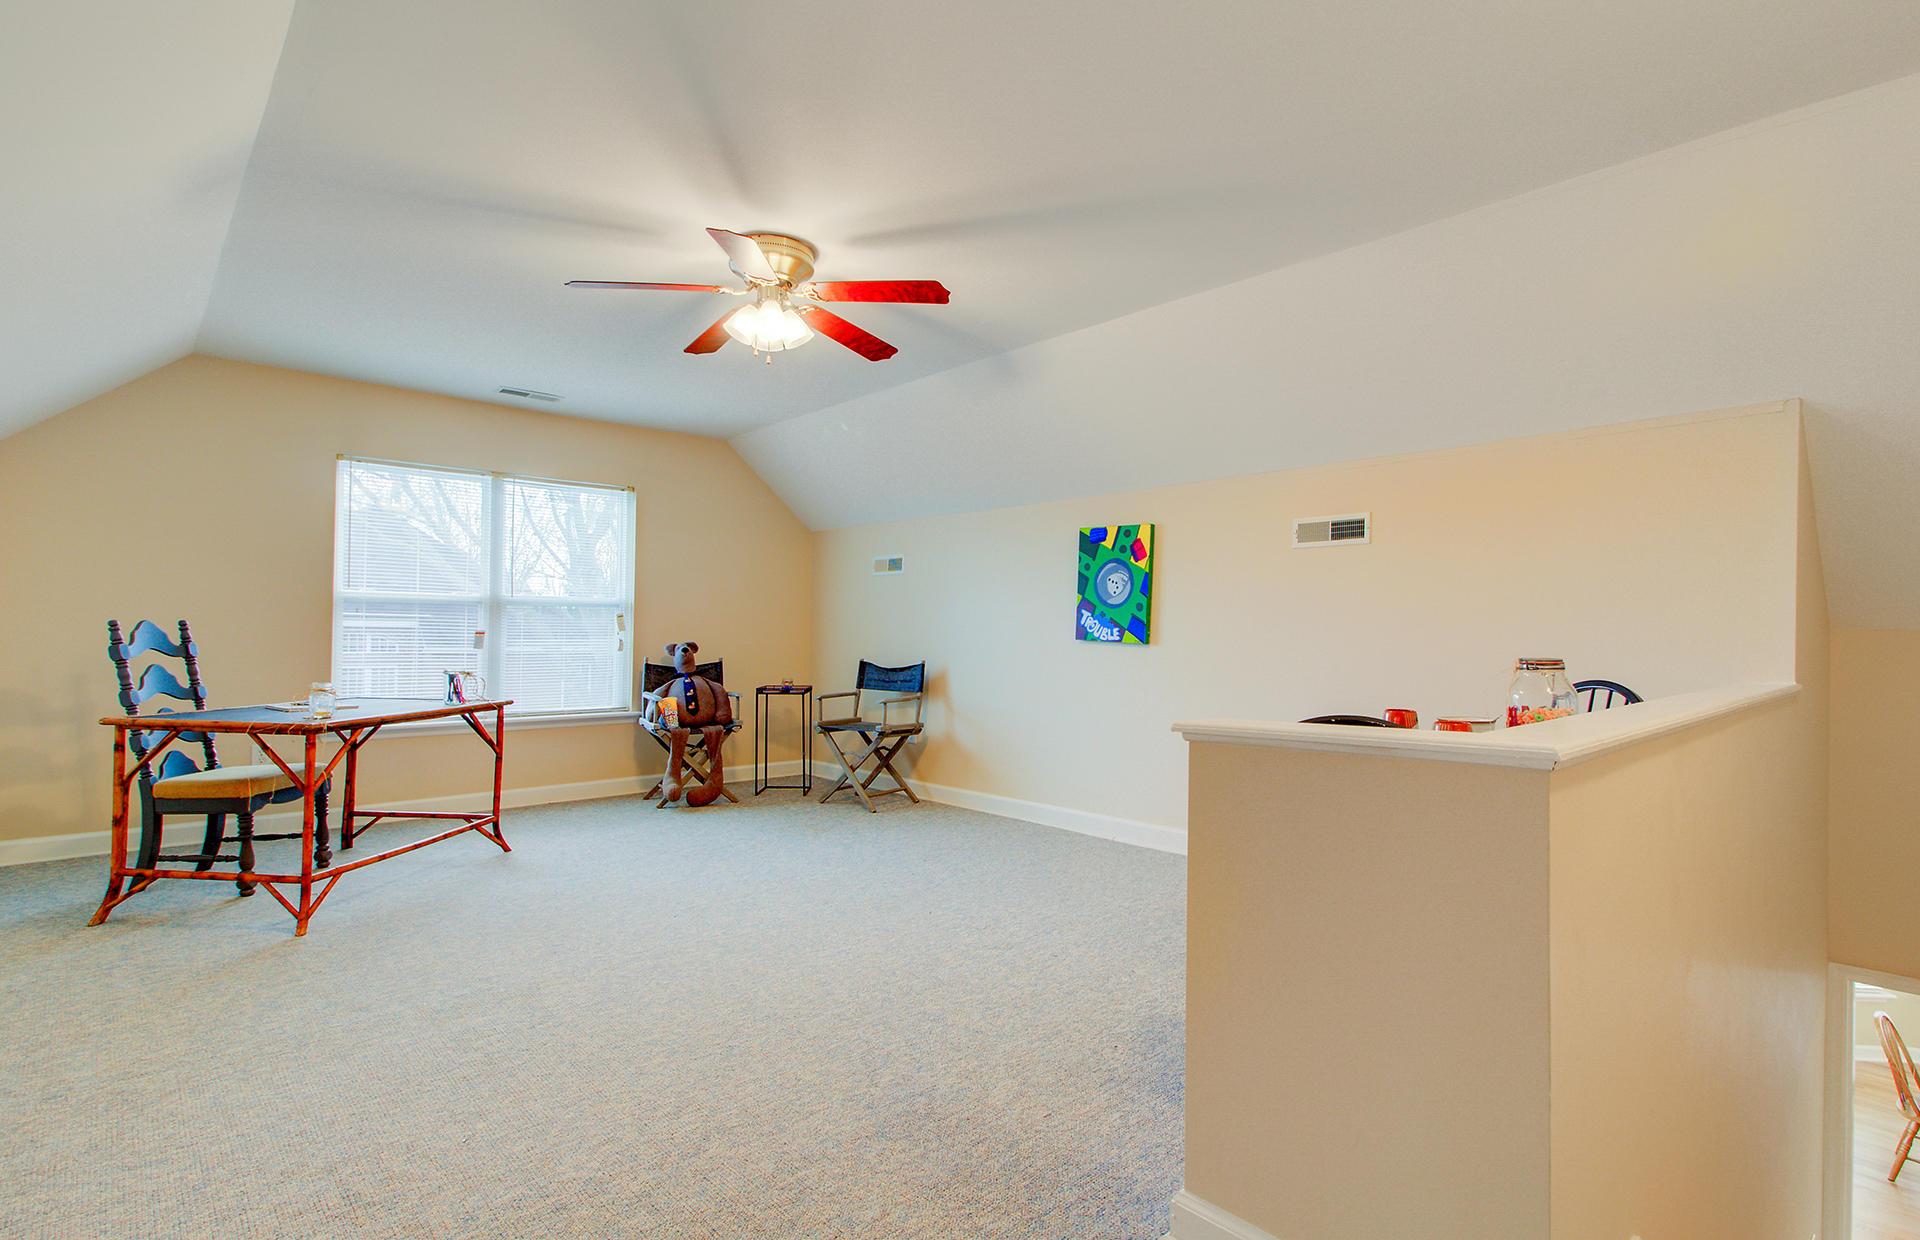 Bakers Landing Homes For Sale - 105 River Oak, North Charleston, SC - 18